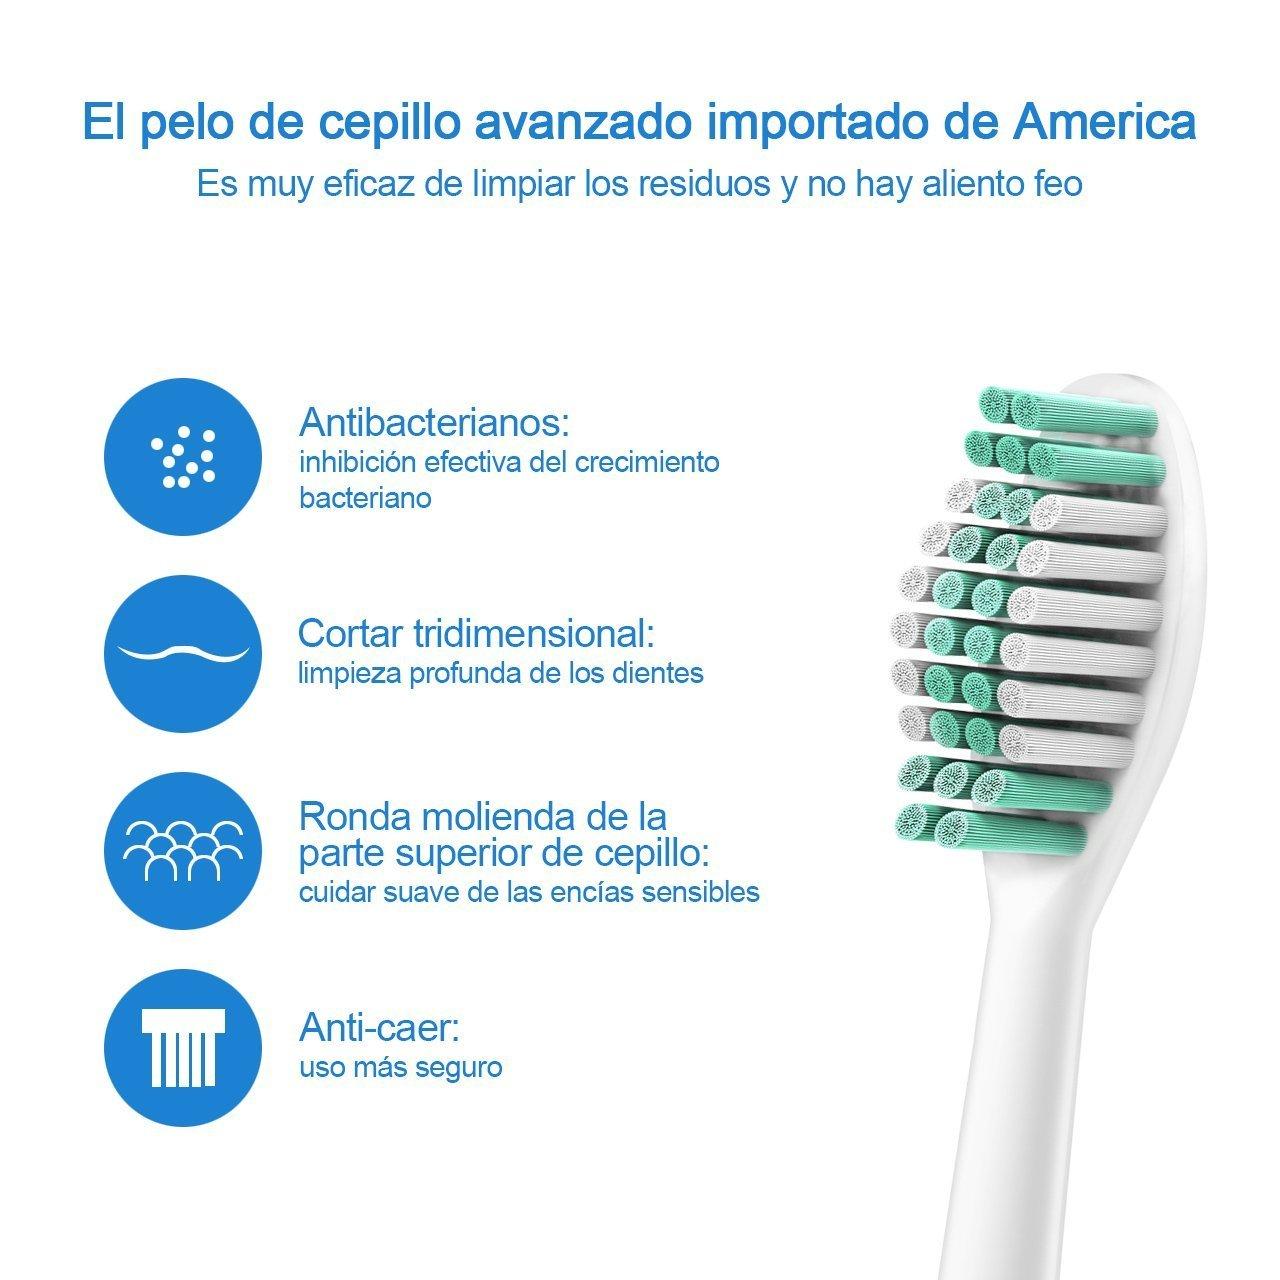 HEXU Cabezales de Cepillos, 2 Cabezales para Cepillo de Dientes Eléctricos Ultrasónicos Recargable ,2 unidades: Amazon.es: Electrónica